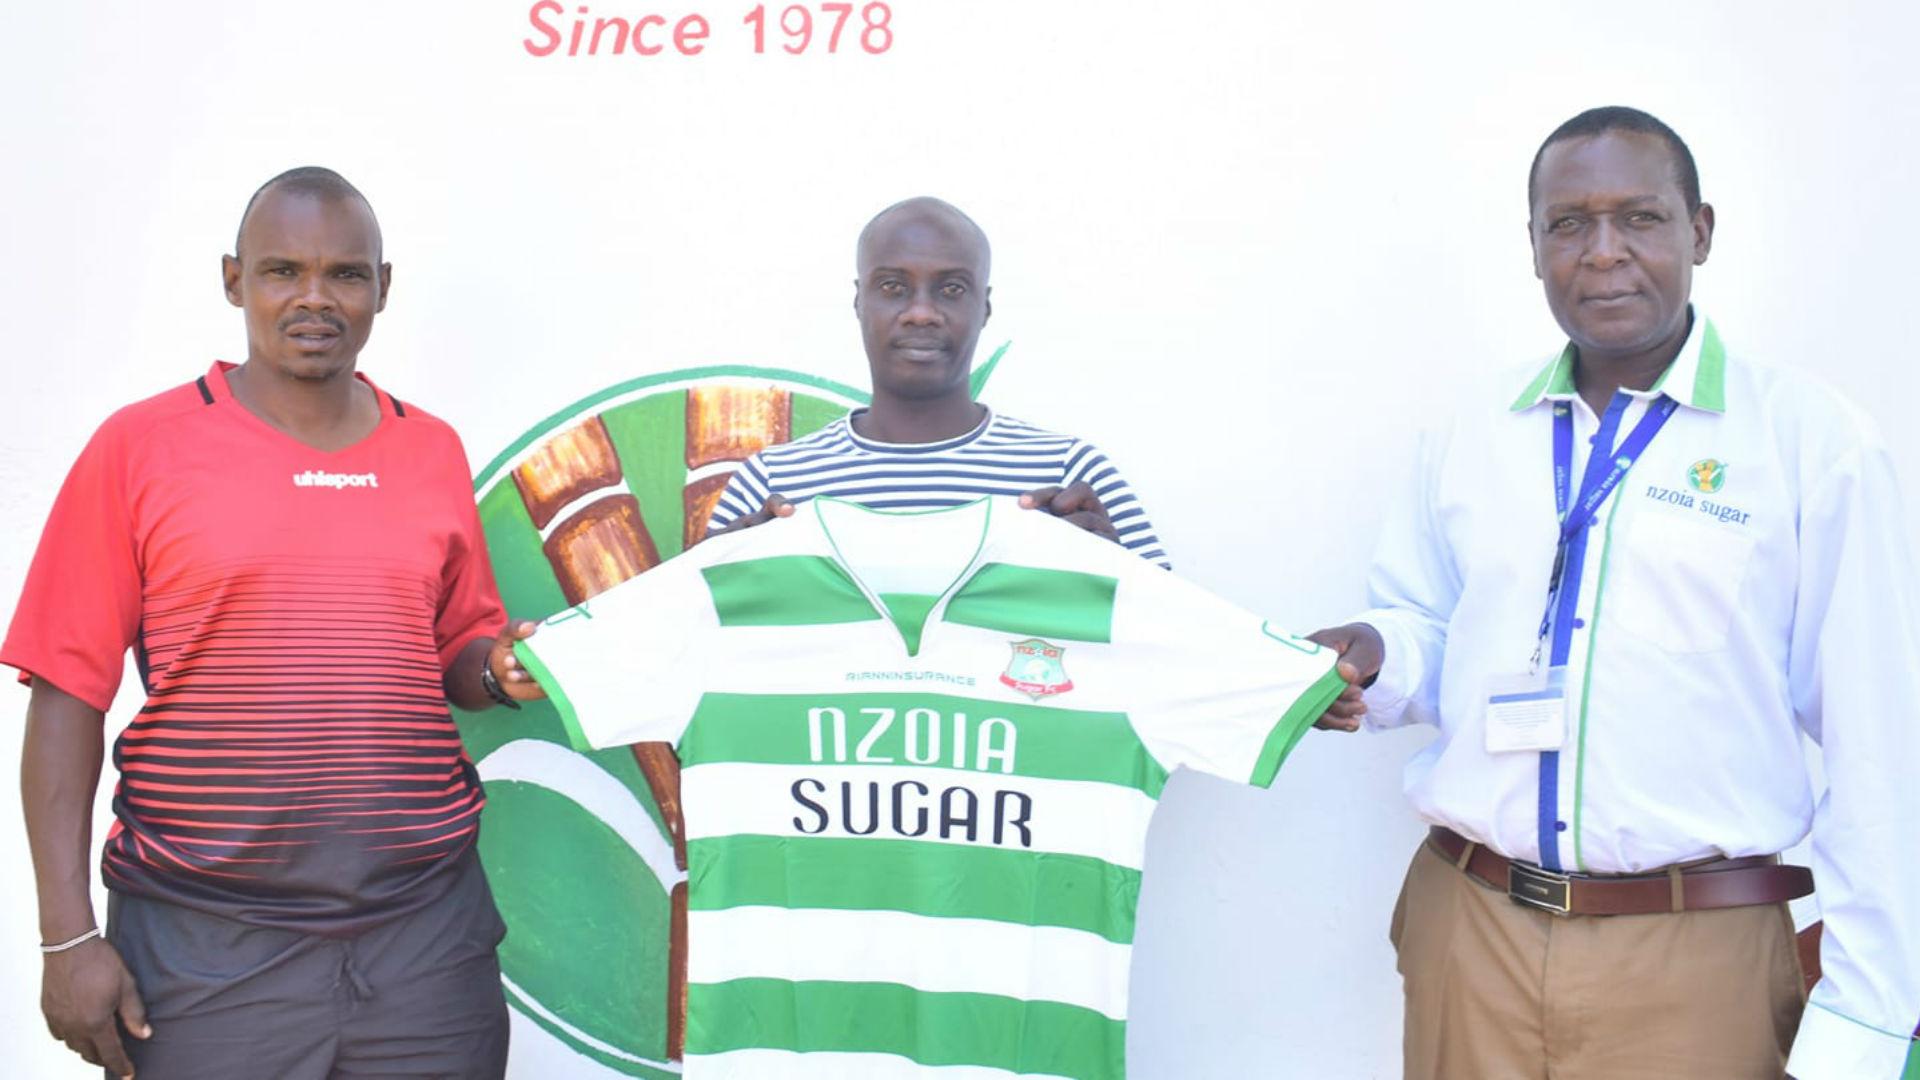 Shikanda named new coach at FKF Premier League side Nzoia Sugar